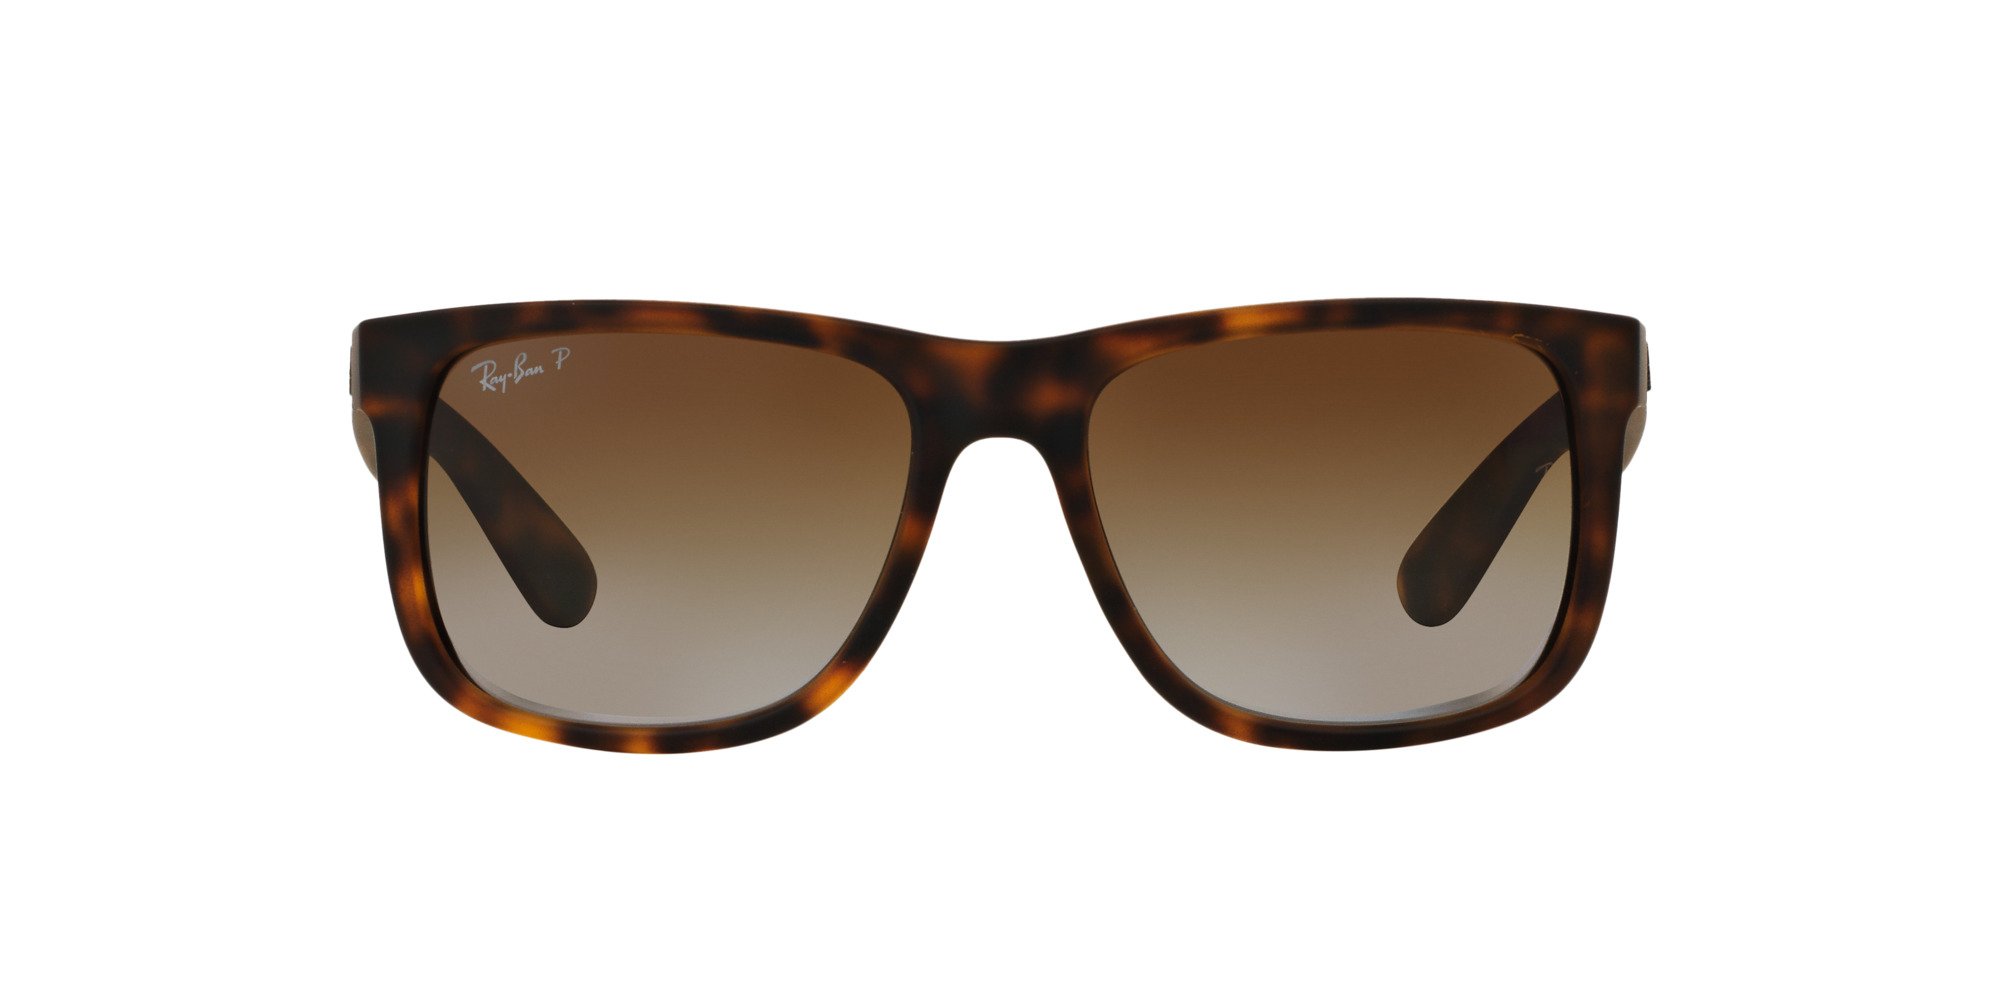 e95380d3e2 Ripley - Ray Ban Justin Havana Rubber lente Brown Gradient Polarized !